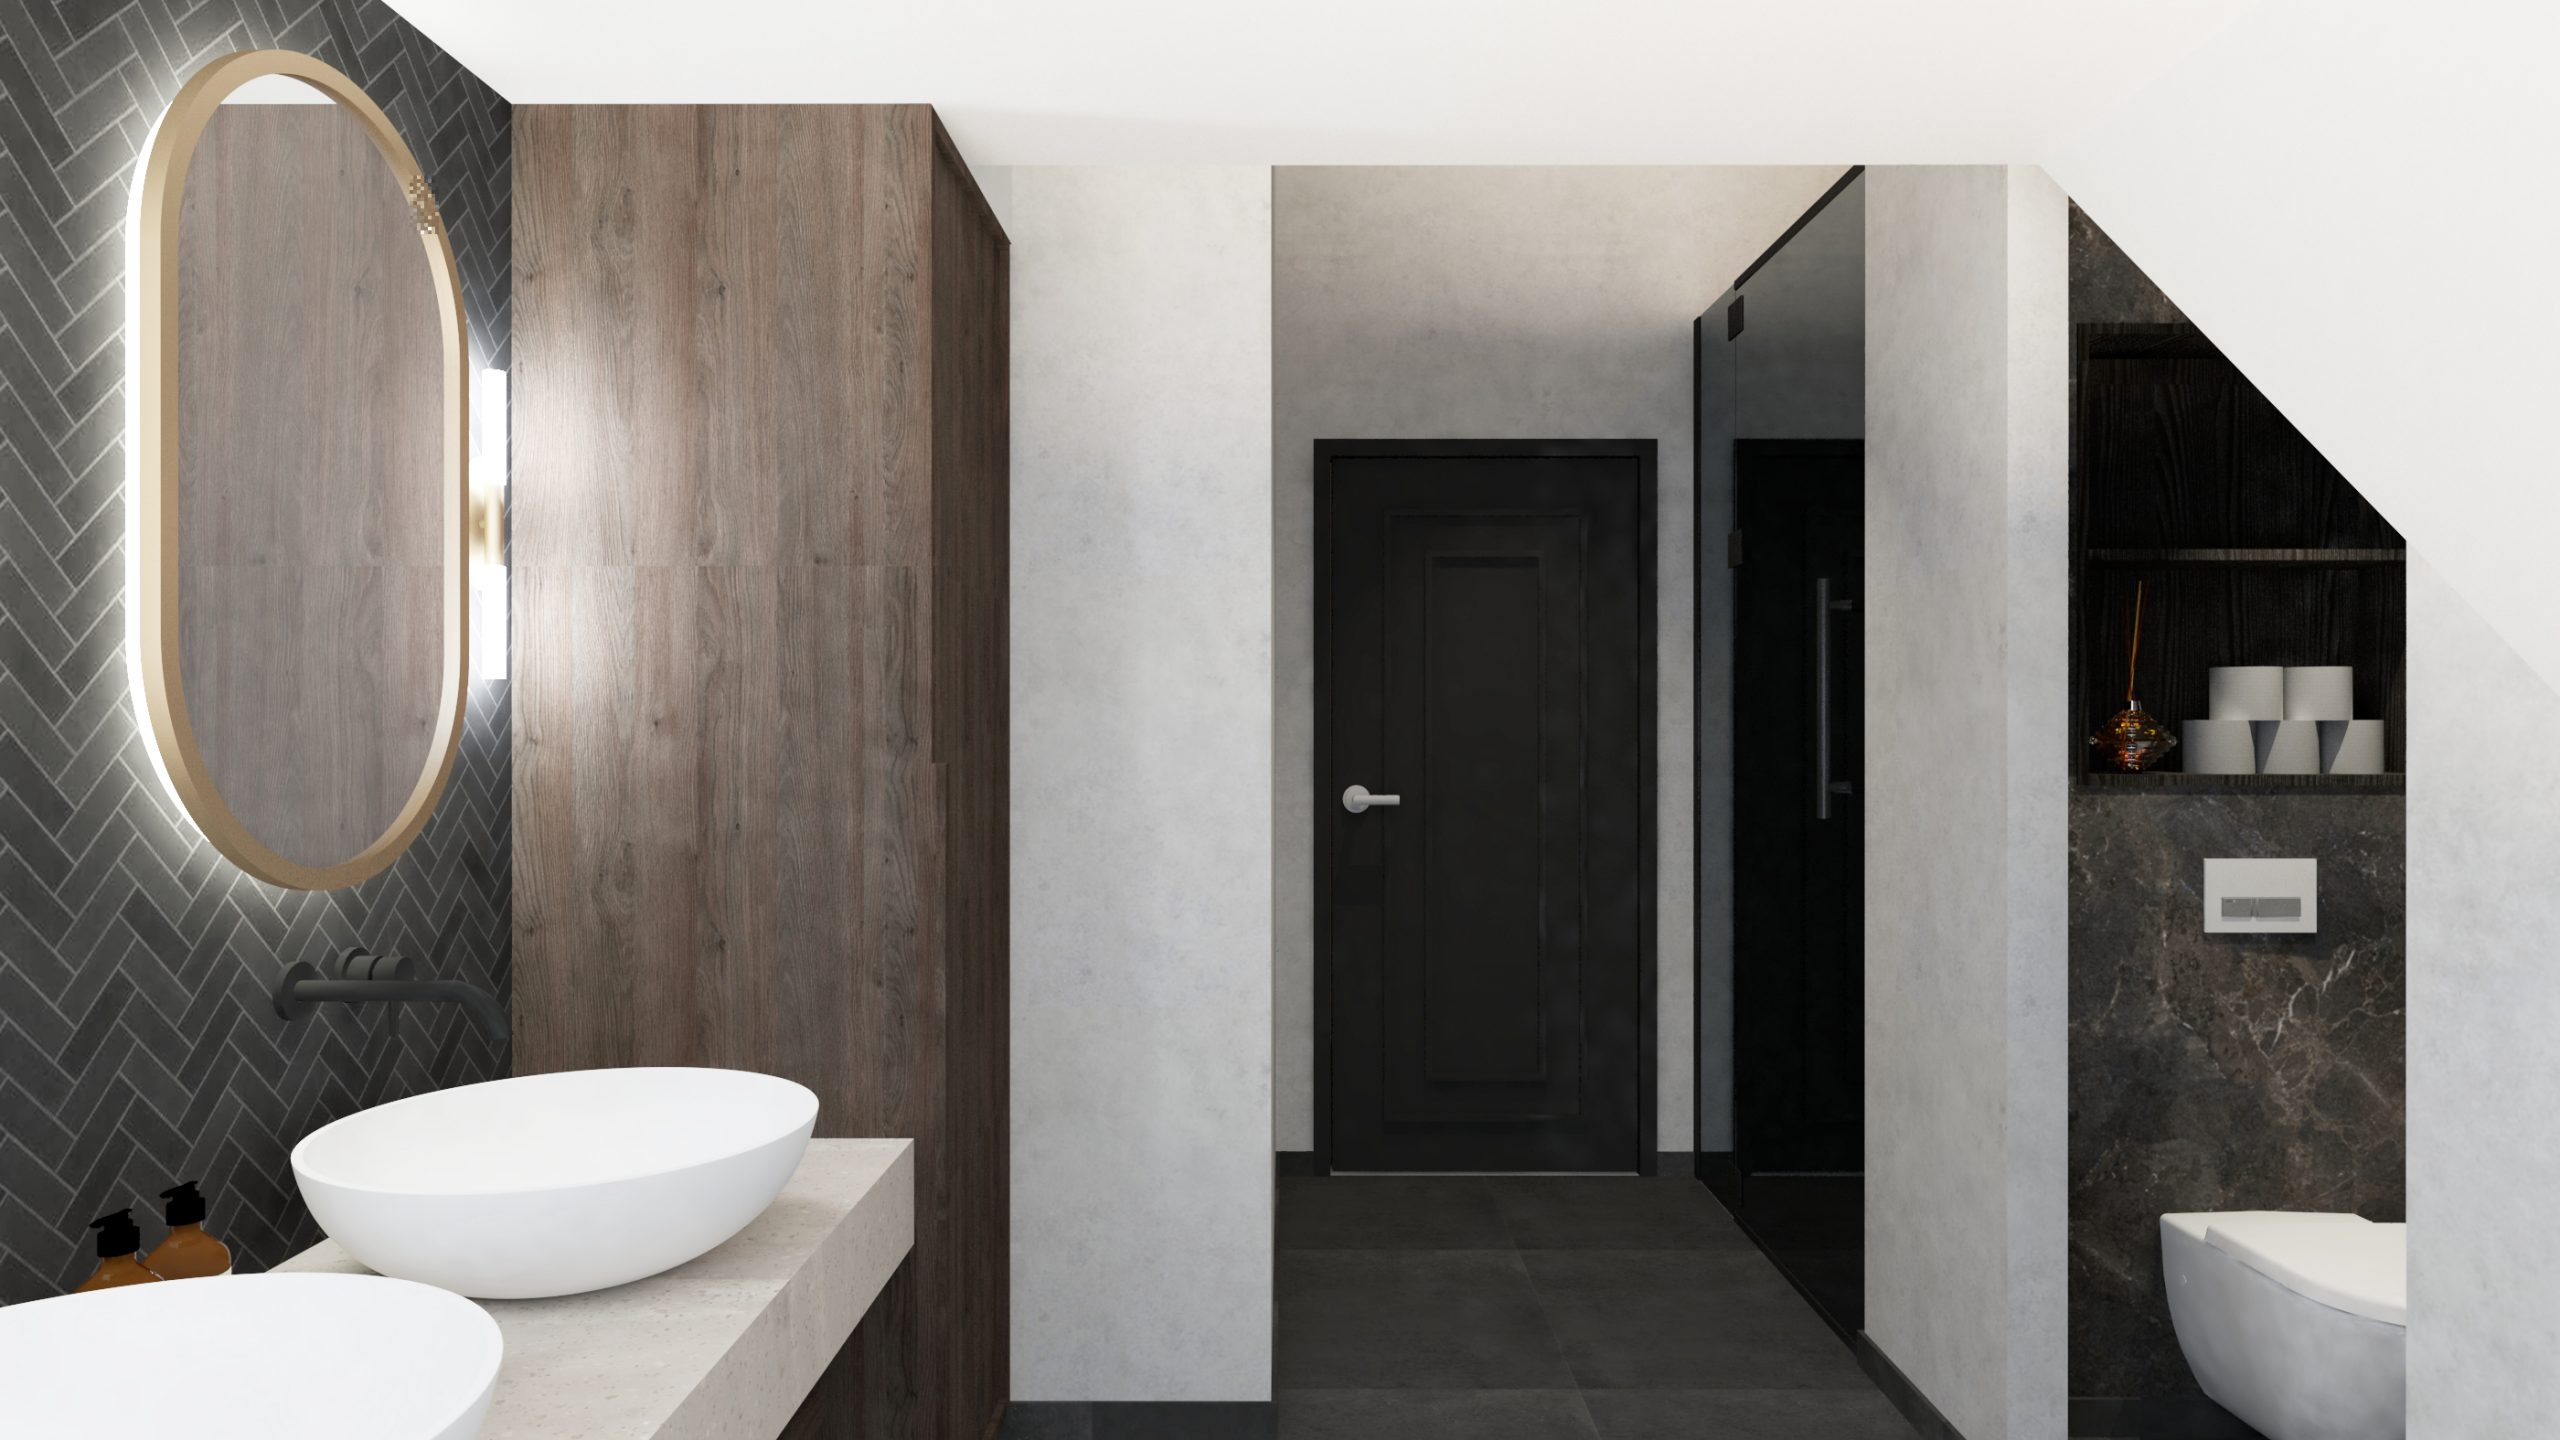 Visgraat wandtegel badkamer